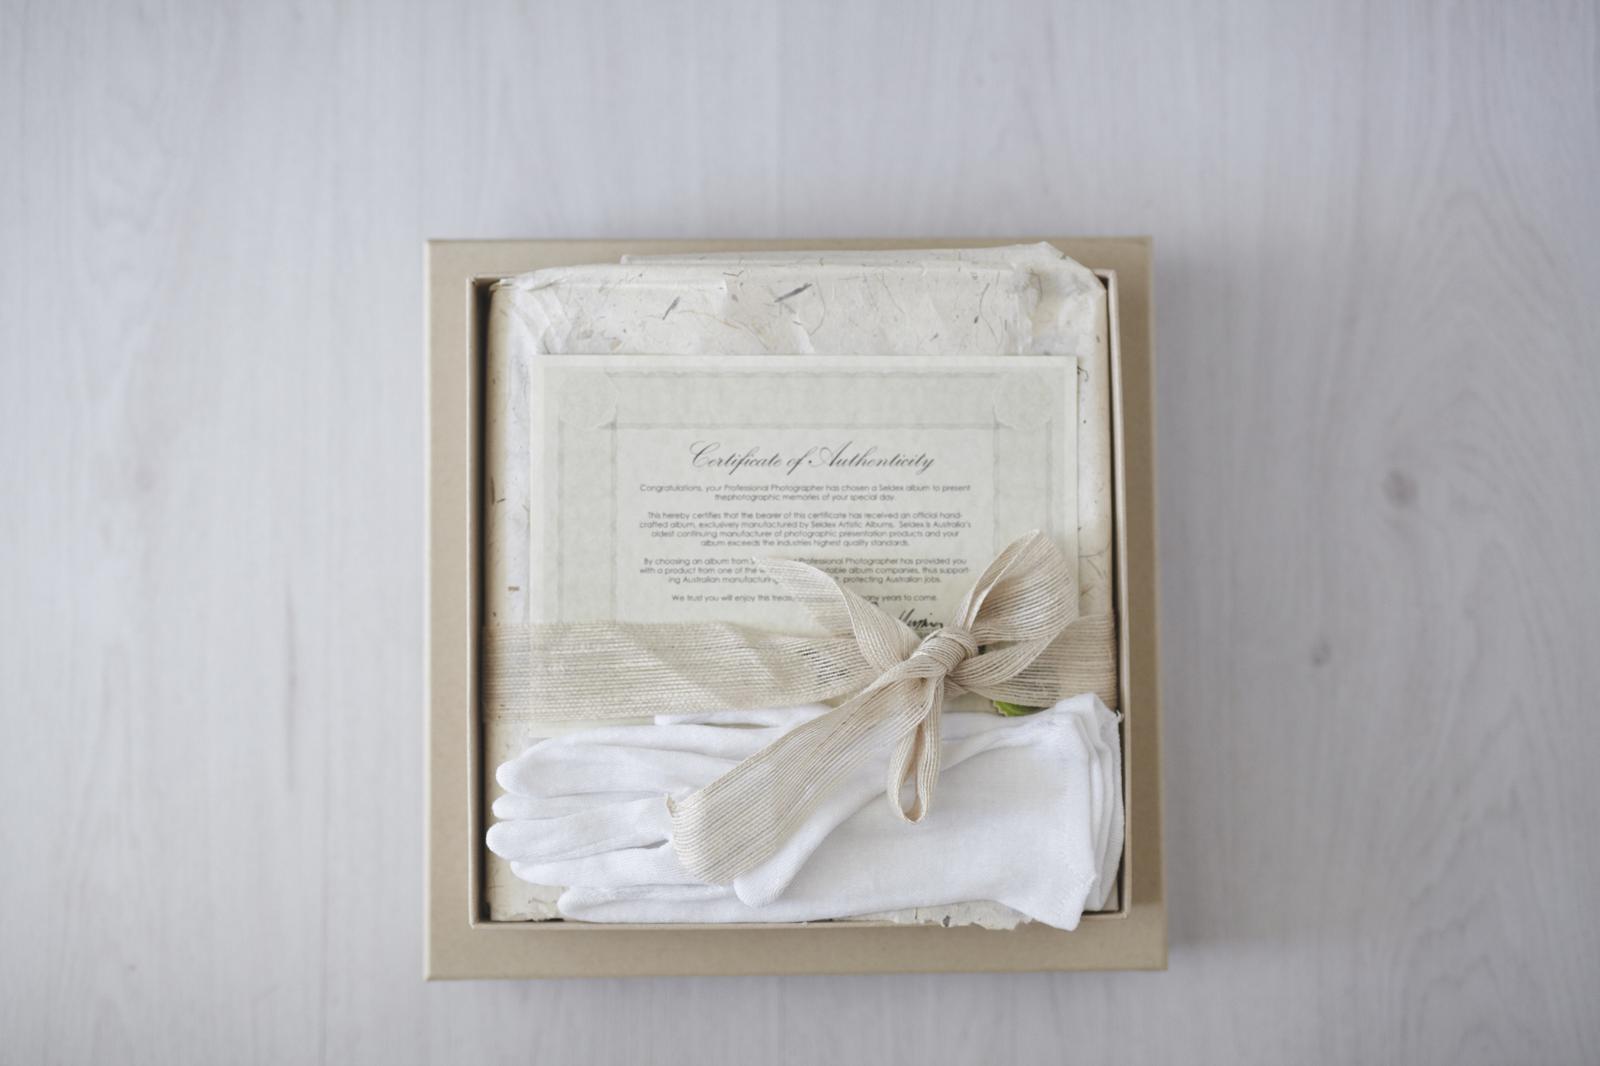 Hand crafted fine art album, custom designed with all your precious memories